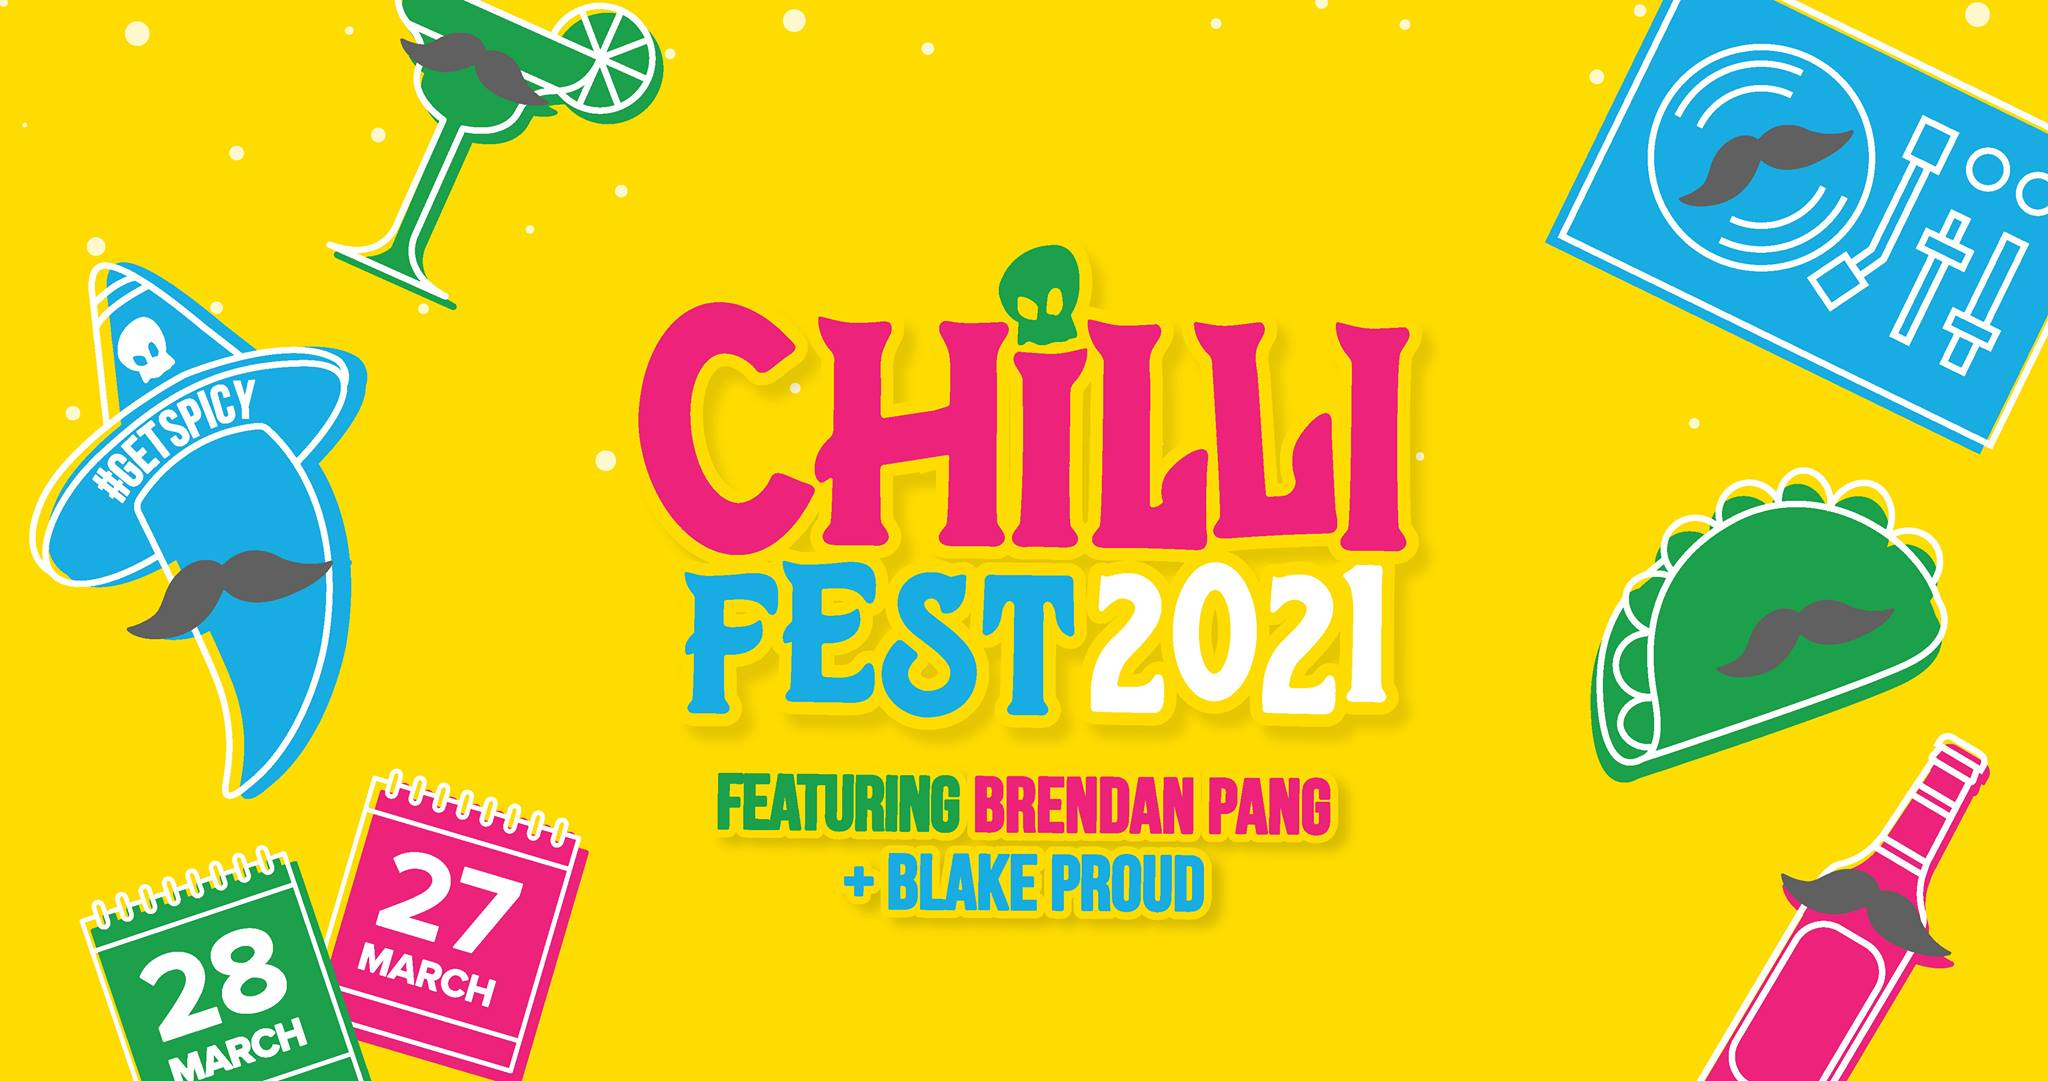 Chilli Fest 2021